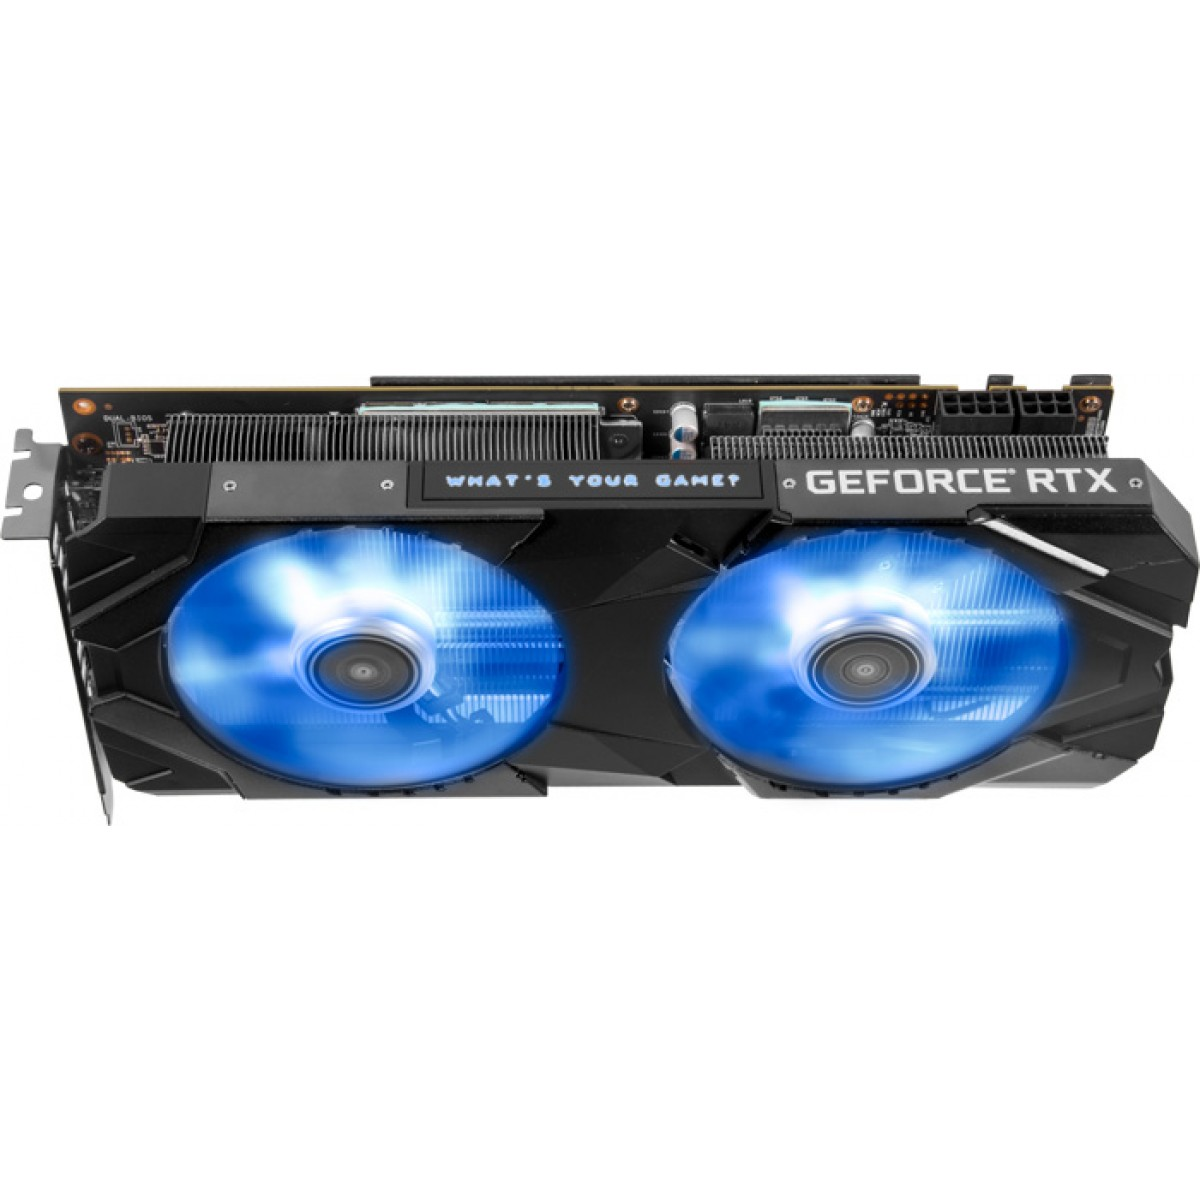 Placa de Vídeo Galax GeForce RTX 2060 Super EX (1-Click OC), 8GB GDDR6, 256Bit, 26ISL6MPX2EX